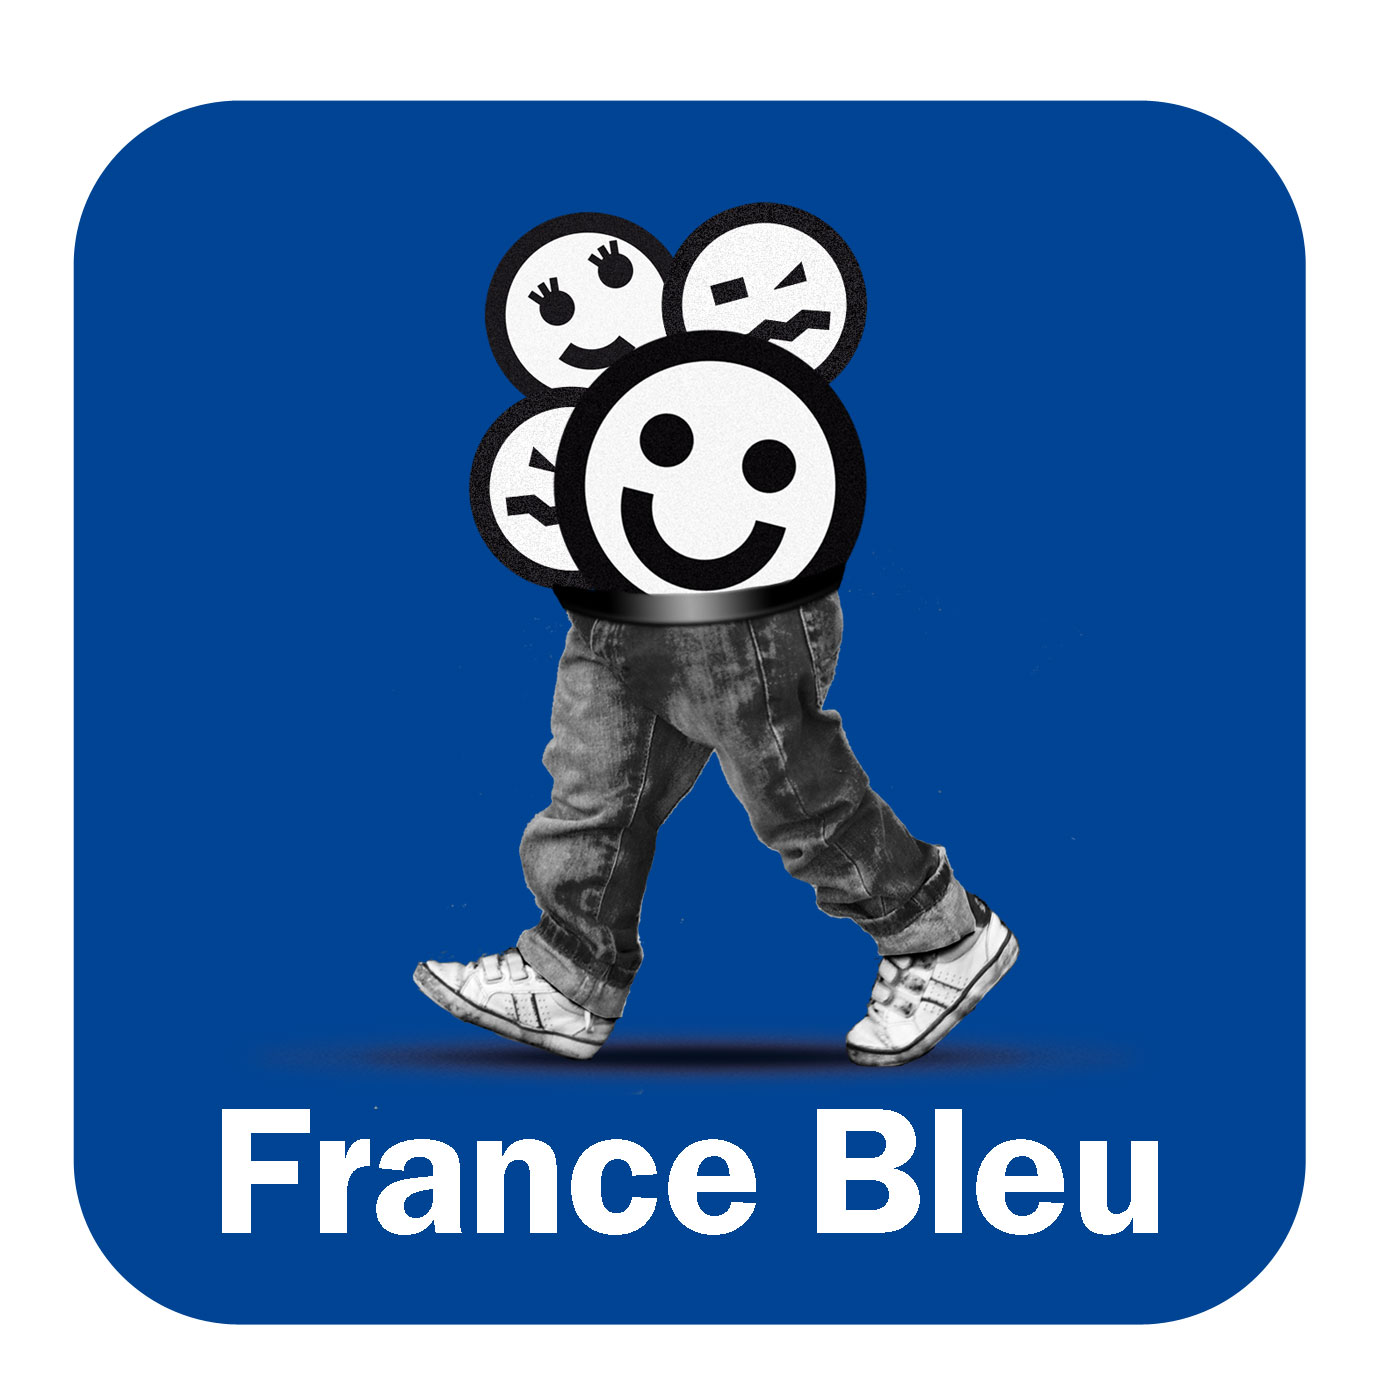 Les histoires judiciaires France Bleu Azur